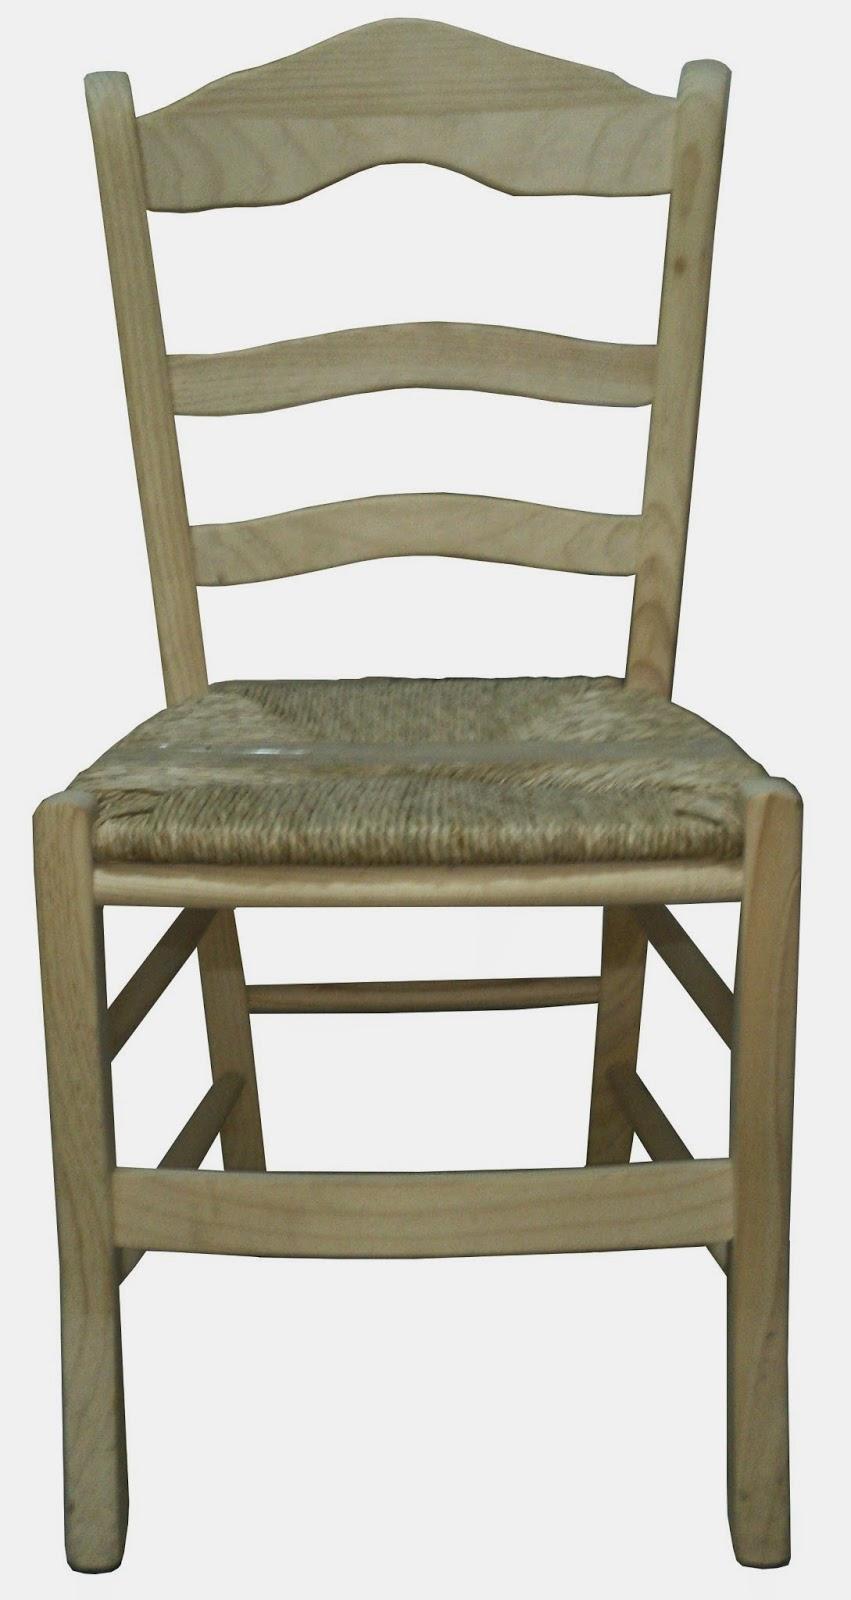 Muebles jenny torreon obtenga ideas dise o de muebles for Muebles ubeda